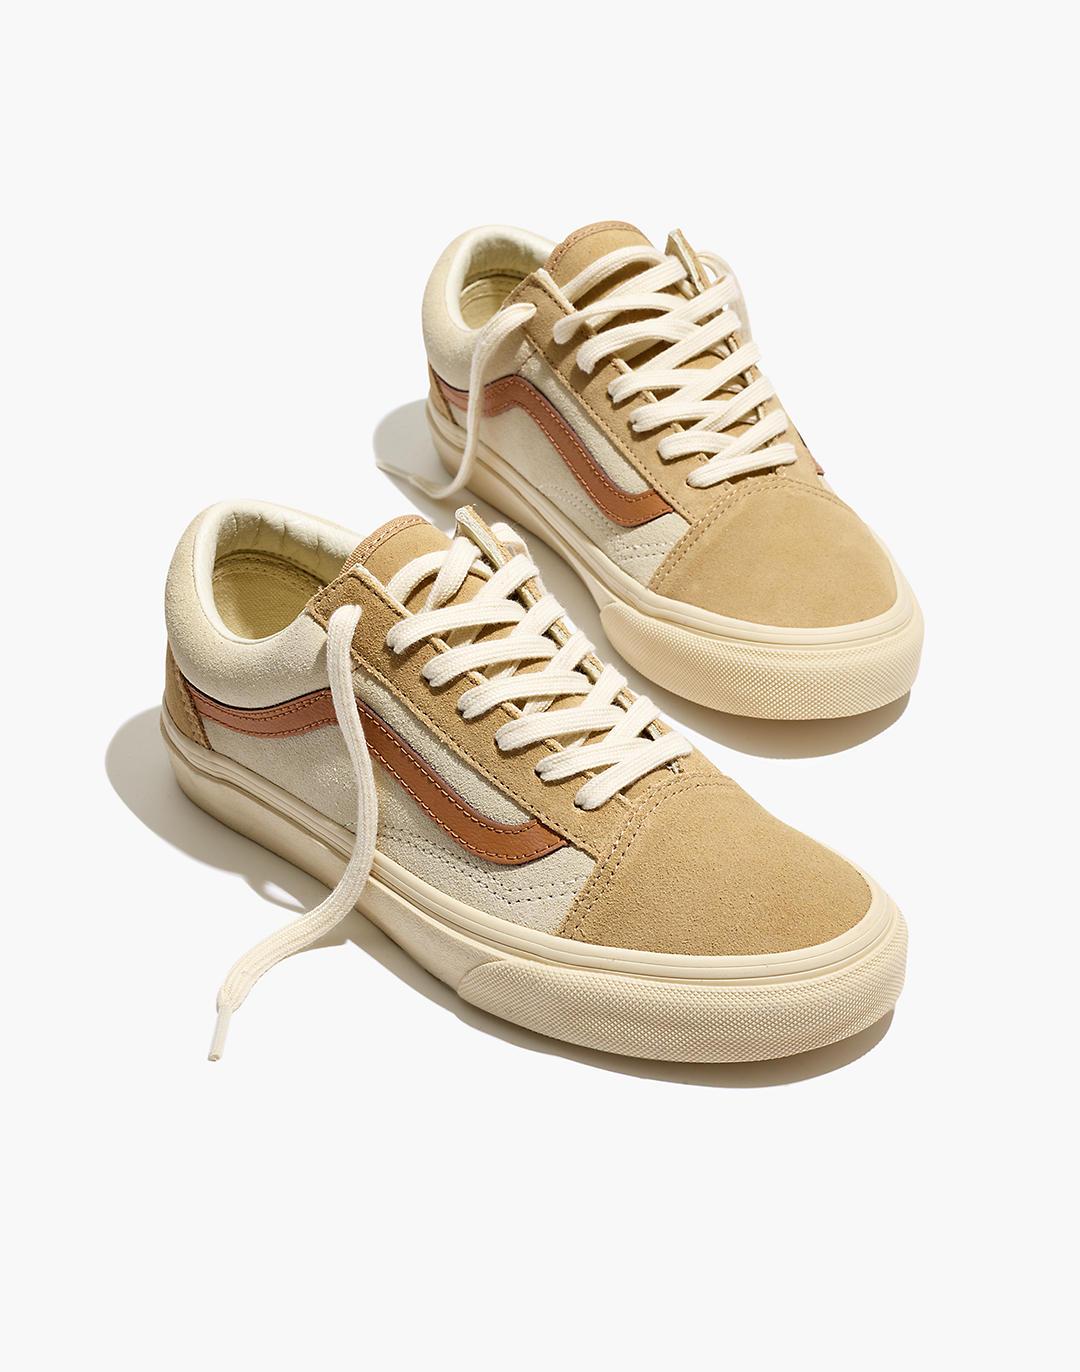 Women's Madewell x Vans® Unisex Old Skool Lace-Up Sneakers in ...